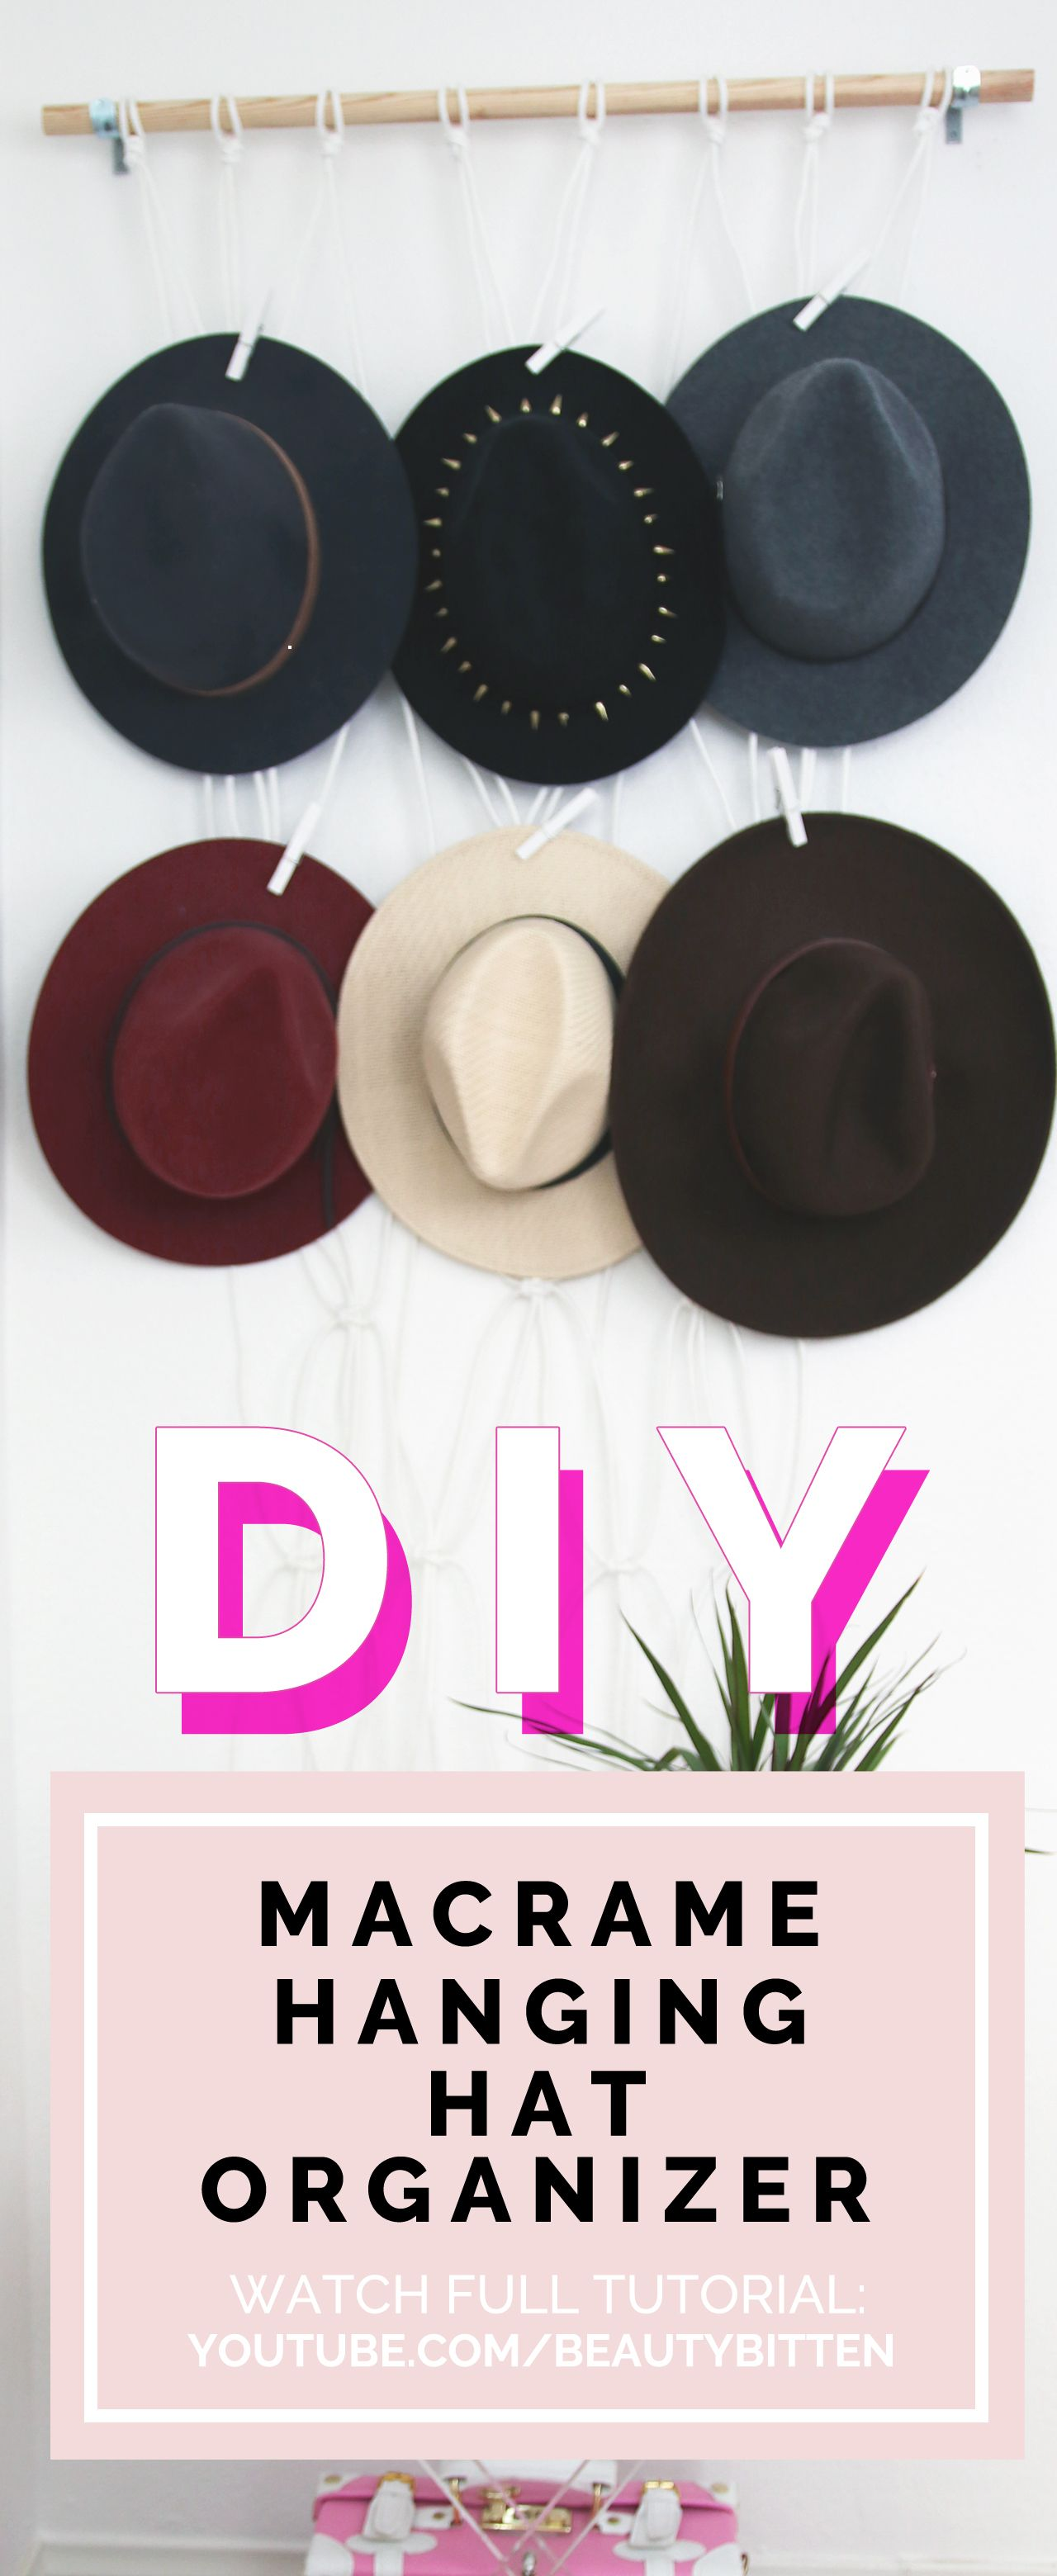 How to create a macrame hanging hat organizer stepbystep